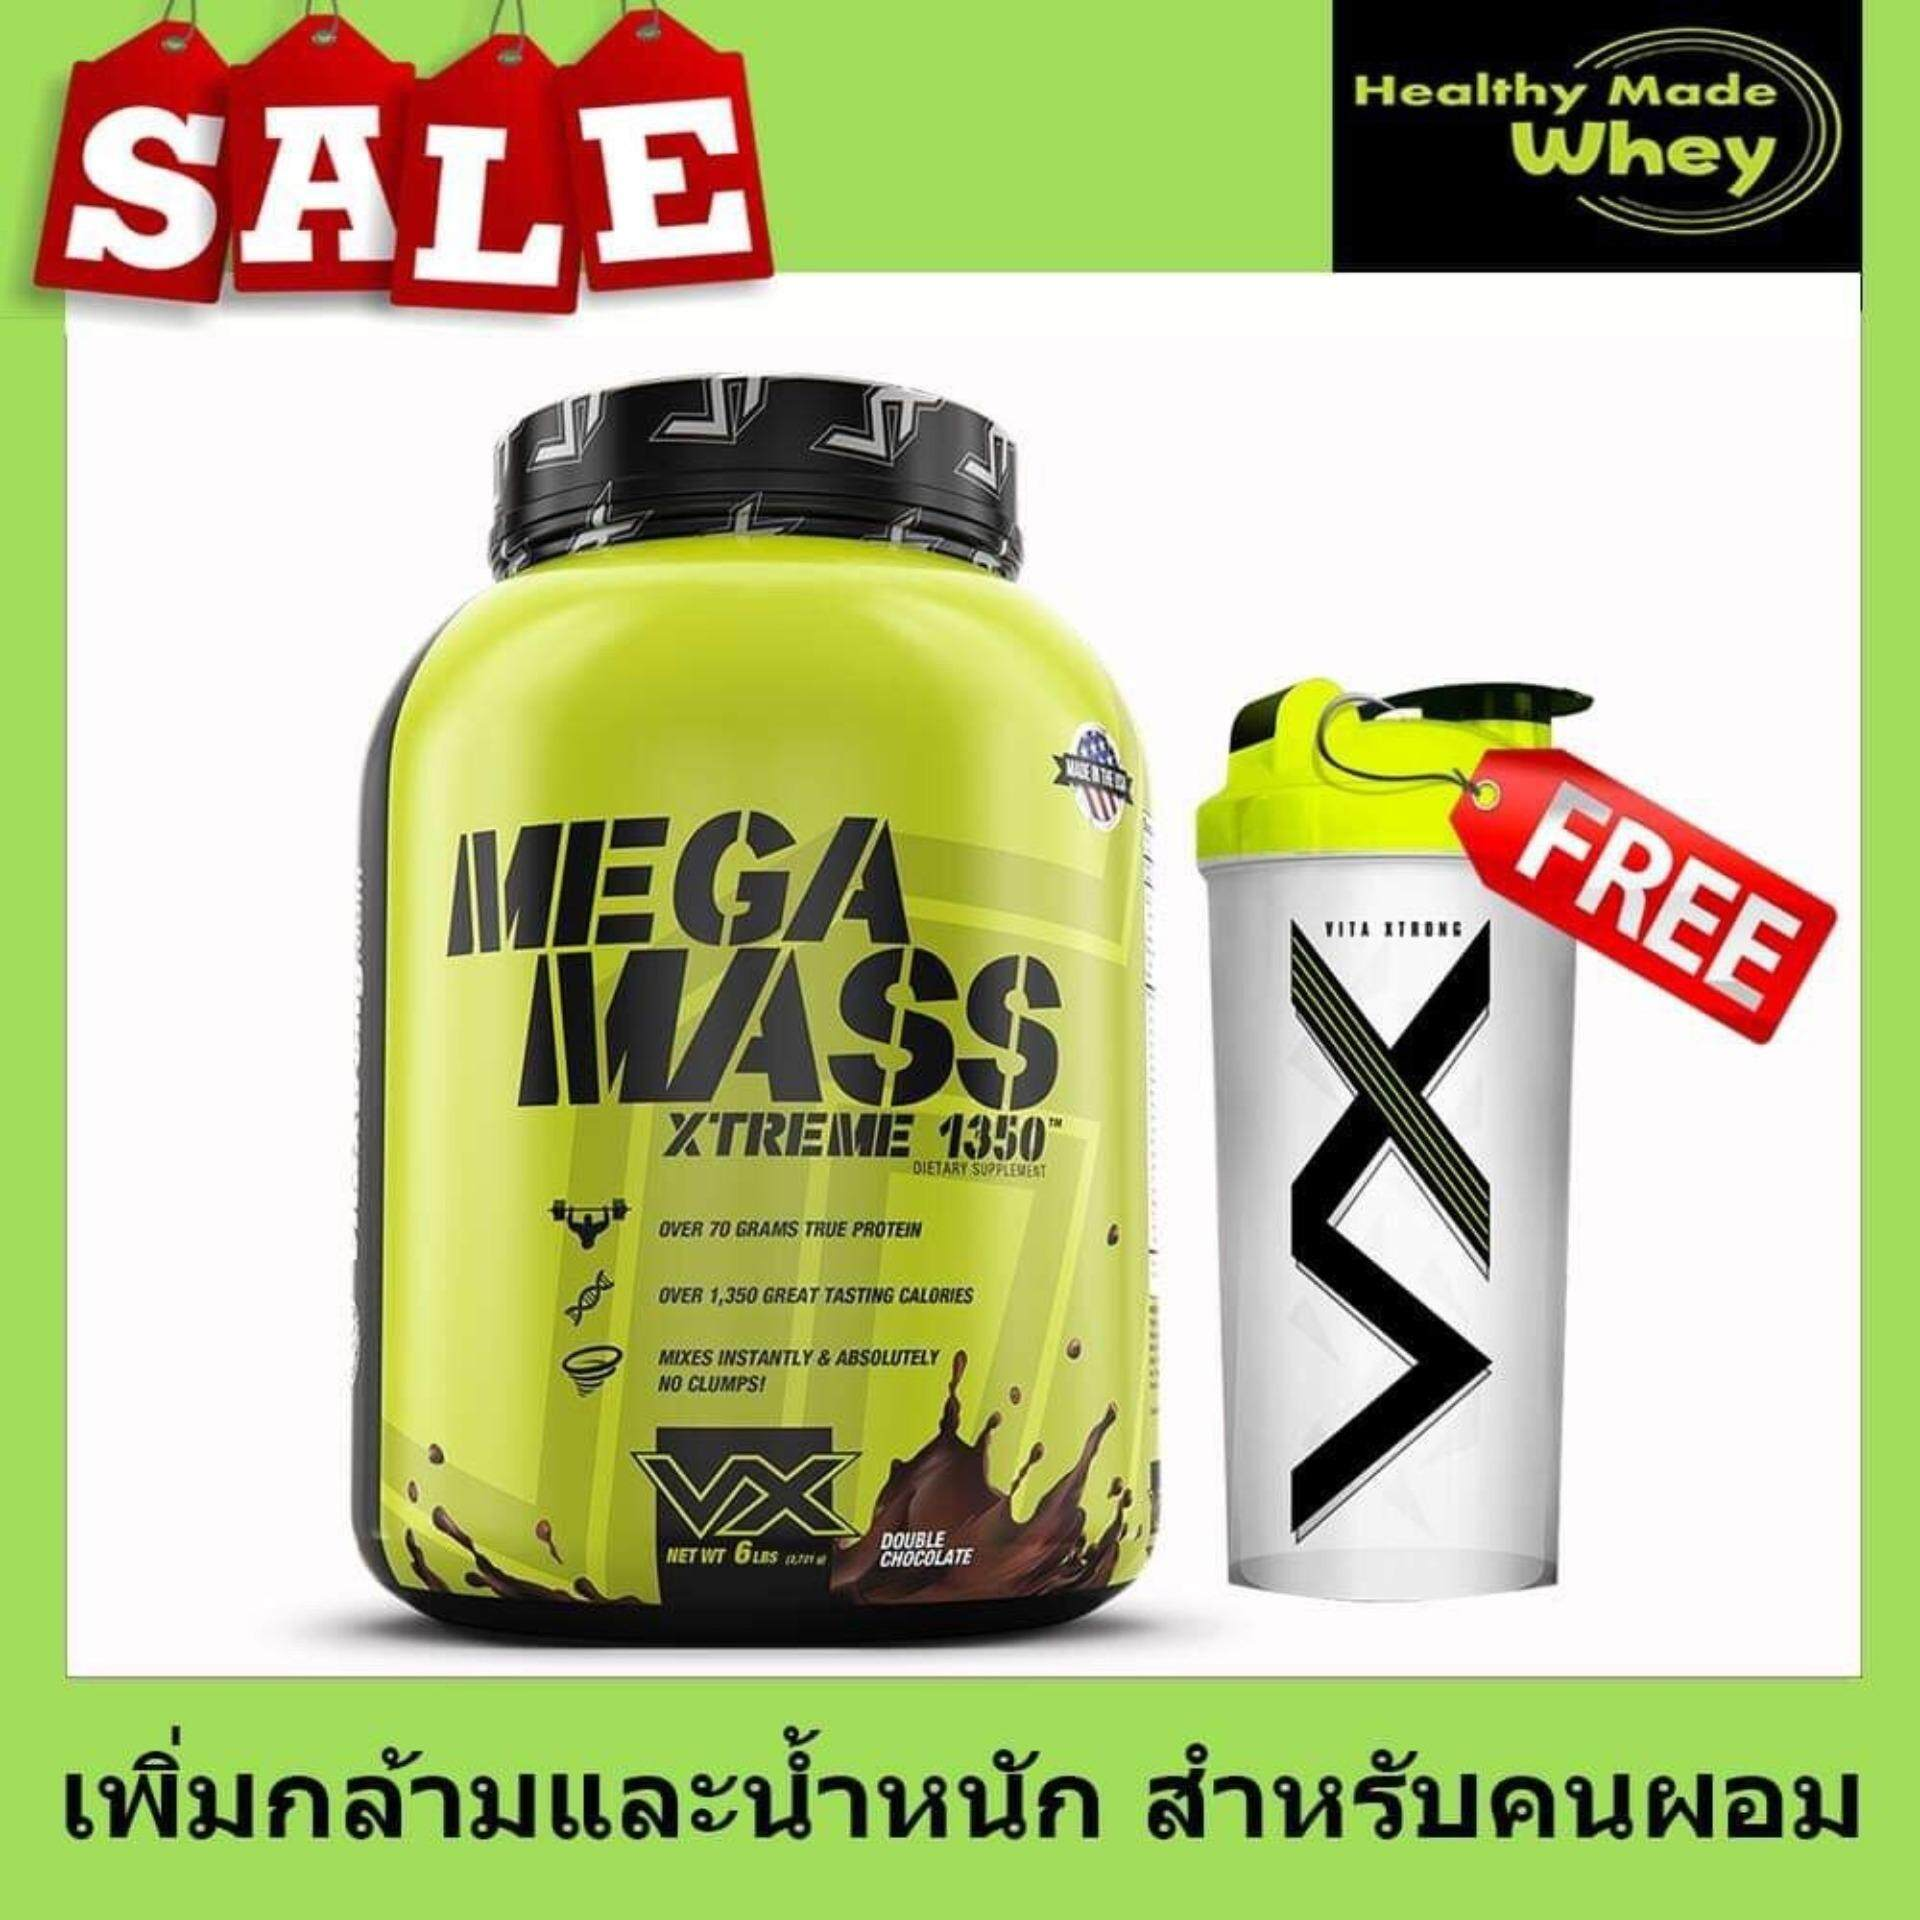 Mega Mass 6lb Chocolate (เมก้าแมส 6ปอนด์ รสช็อคโกแลต) เวย์เพิ่มน้ำหนัก+เพิ่มกล้าม By Healthy Made.